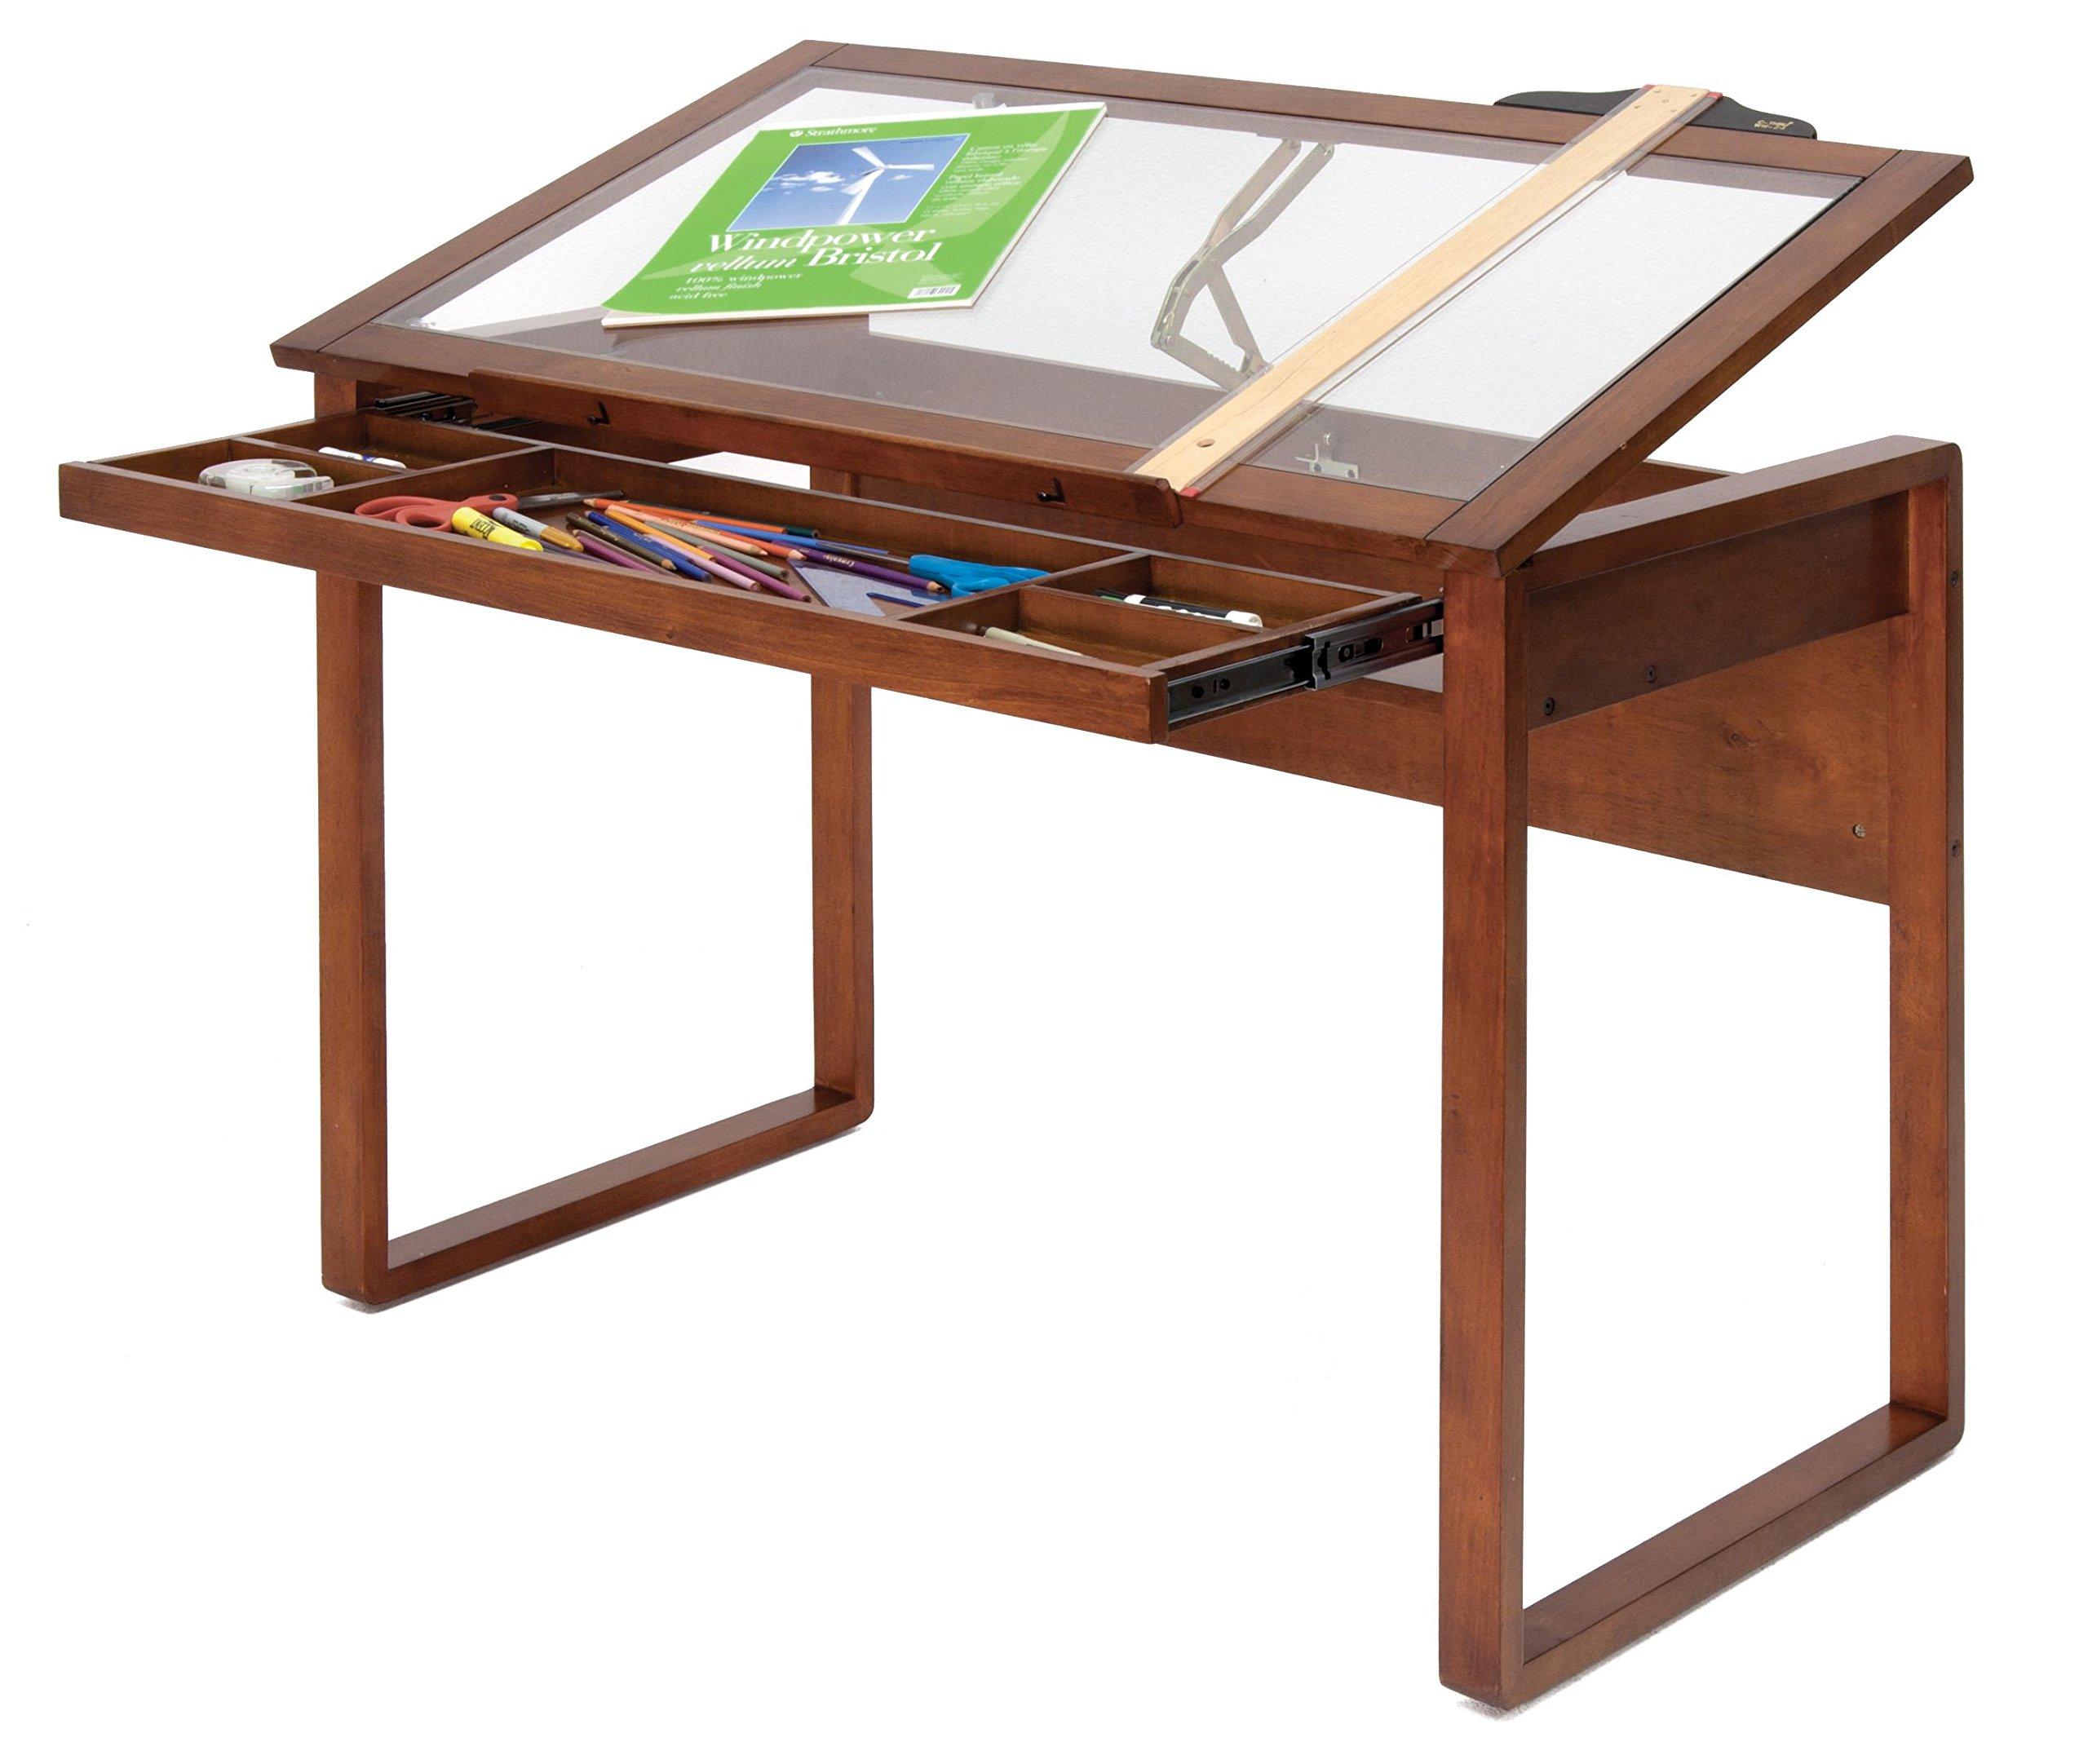 STUDIO DESIGNS INSPIRING CREATIVITY WWW.STUDIODESIGNS.COM Ponderosa Table Glass TOP